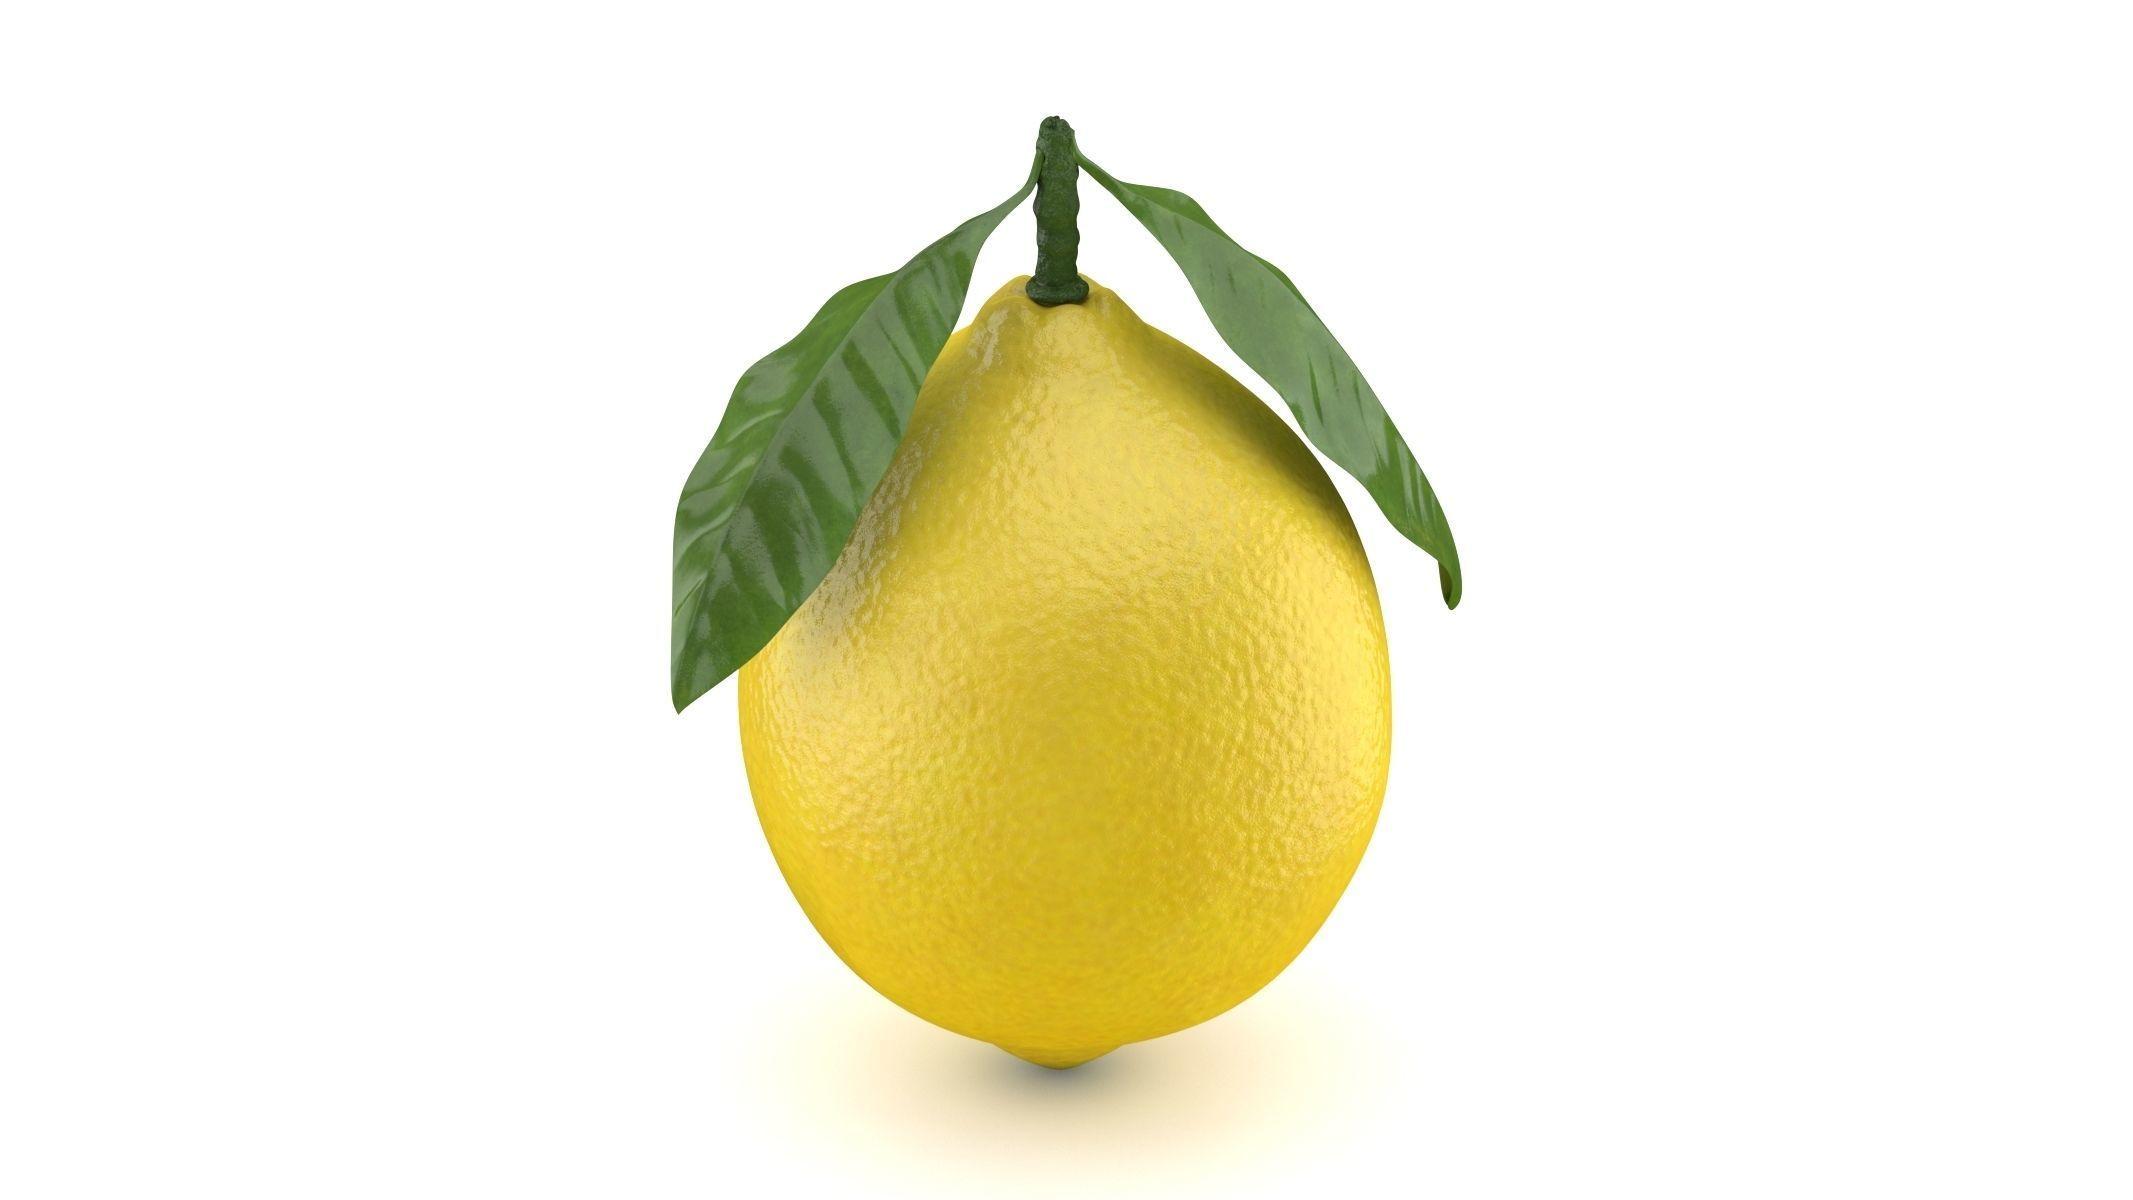 Realistic Lemon with Leaf